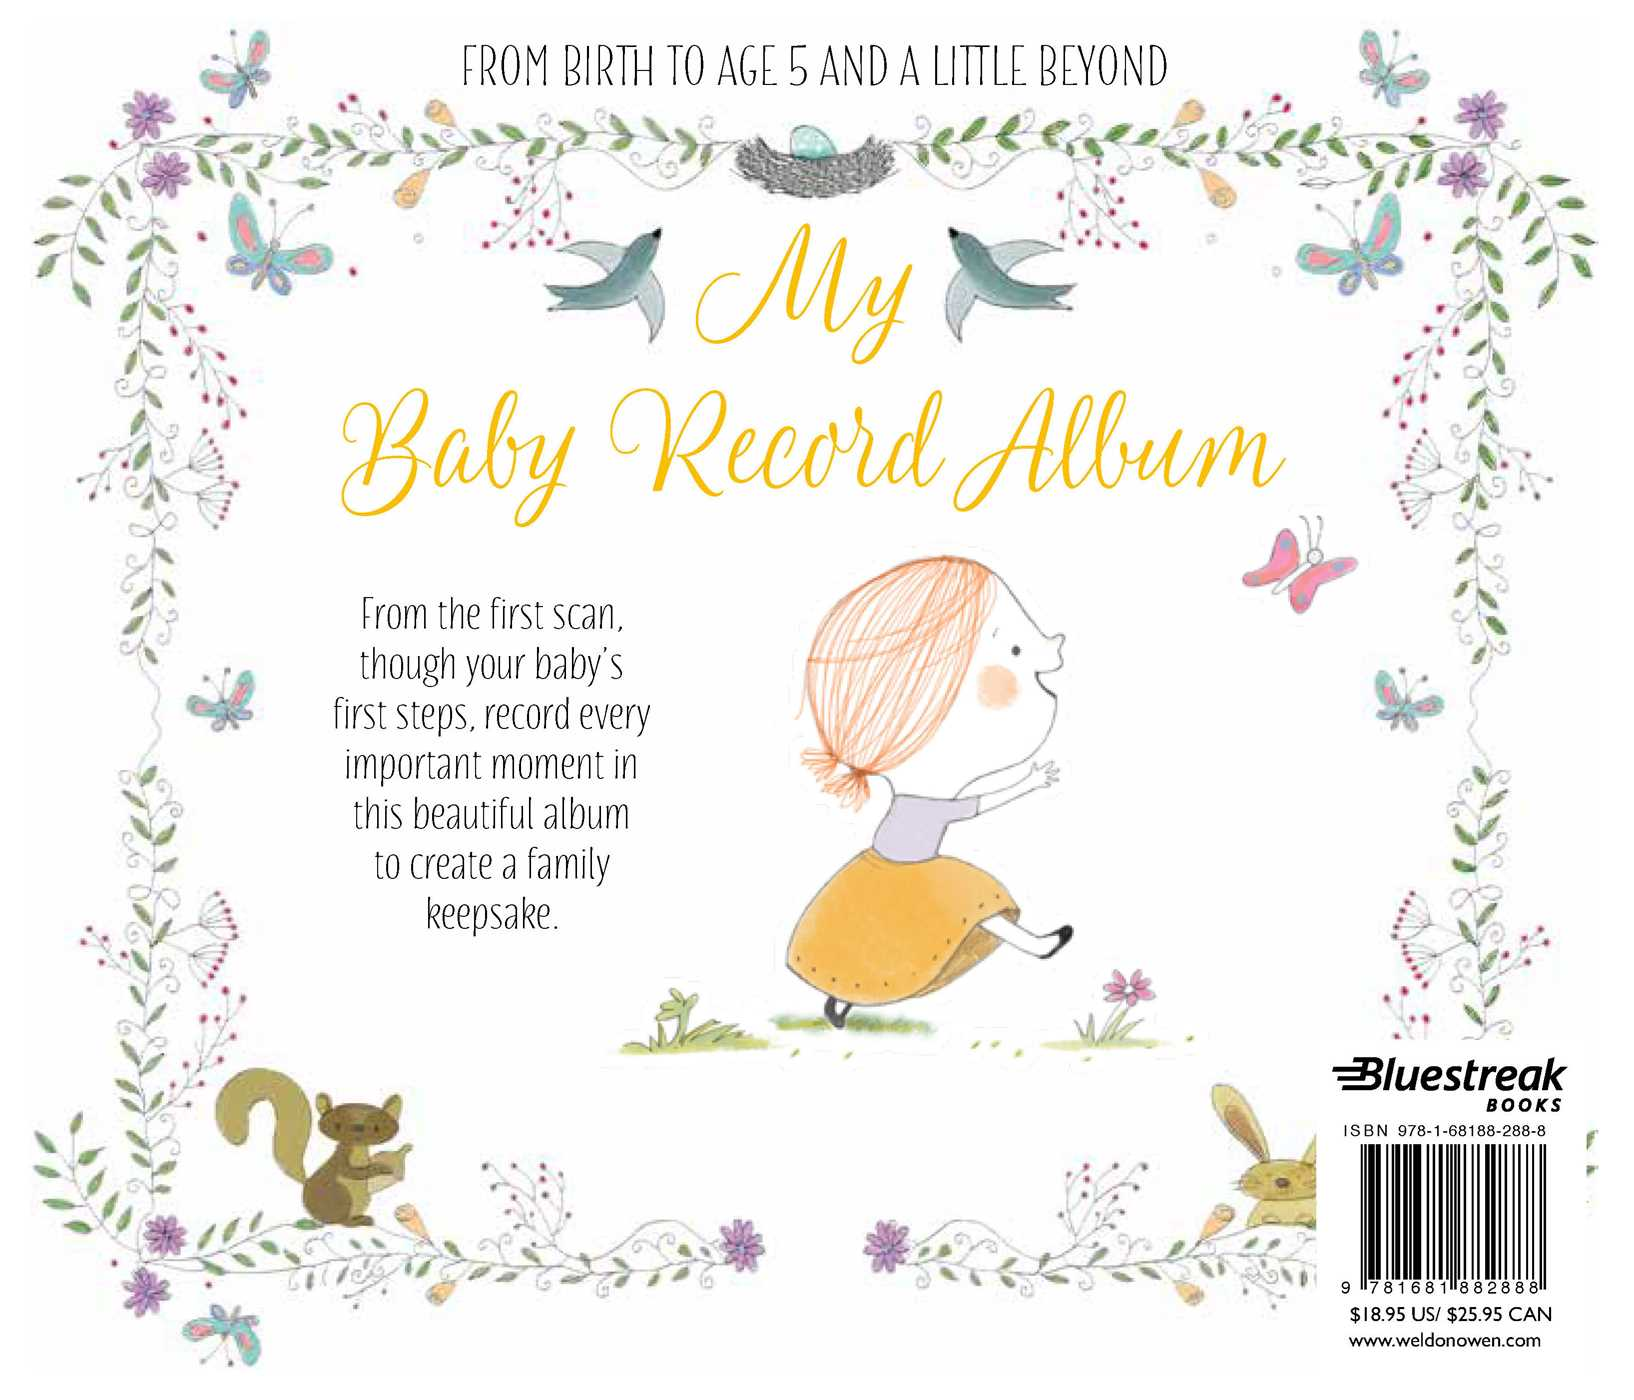 My baby record album 9781681882888 hr back